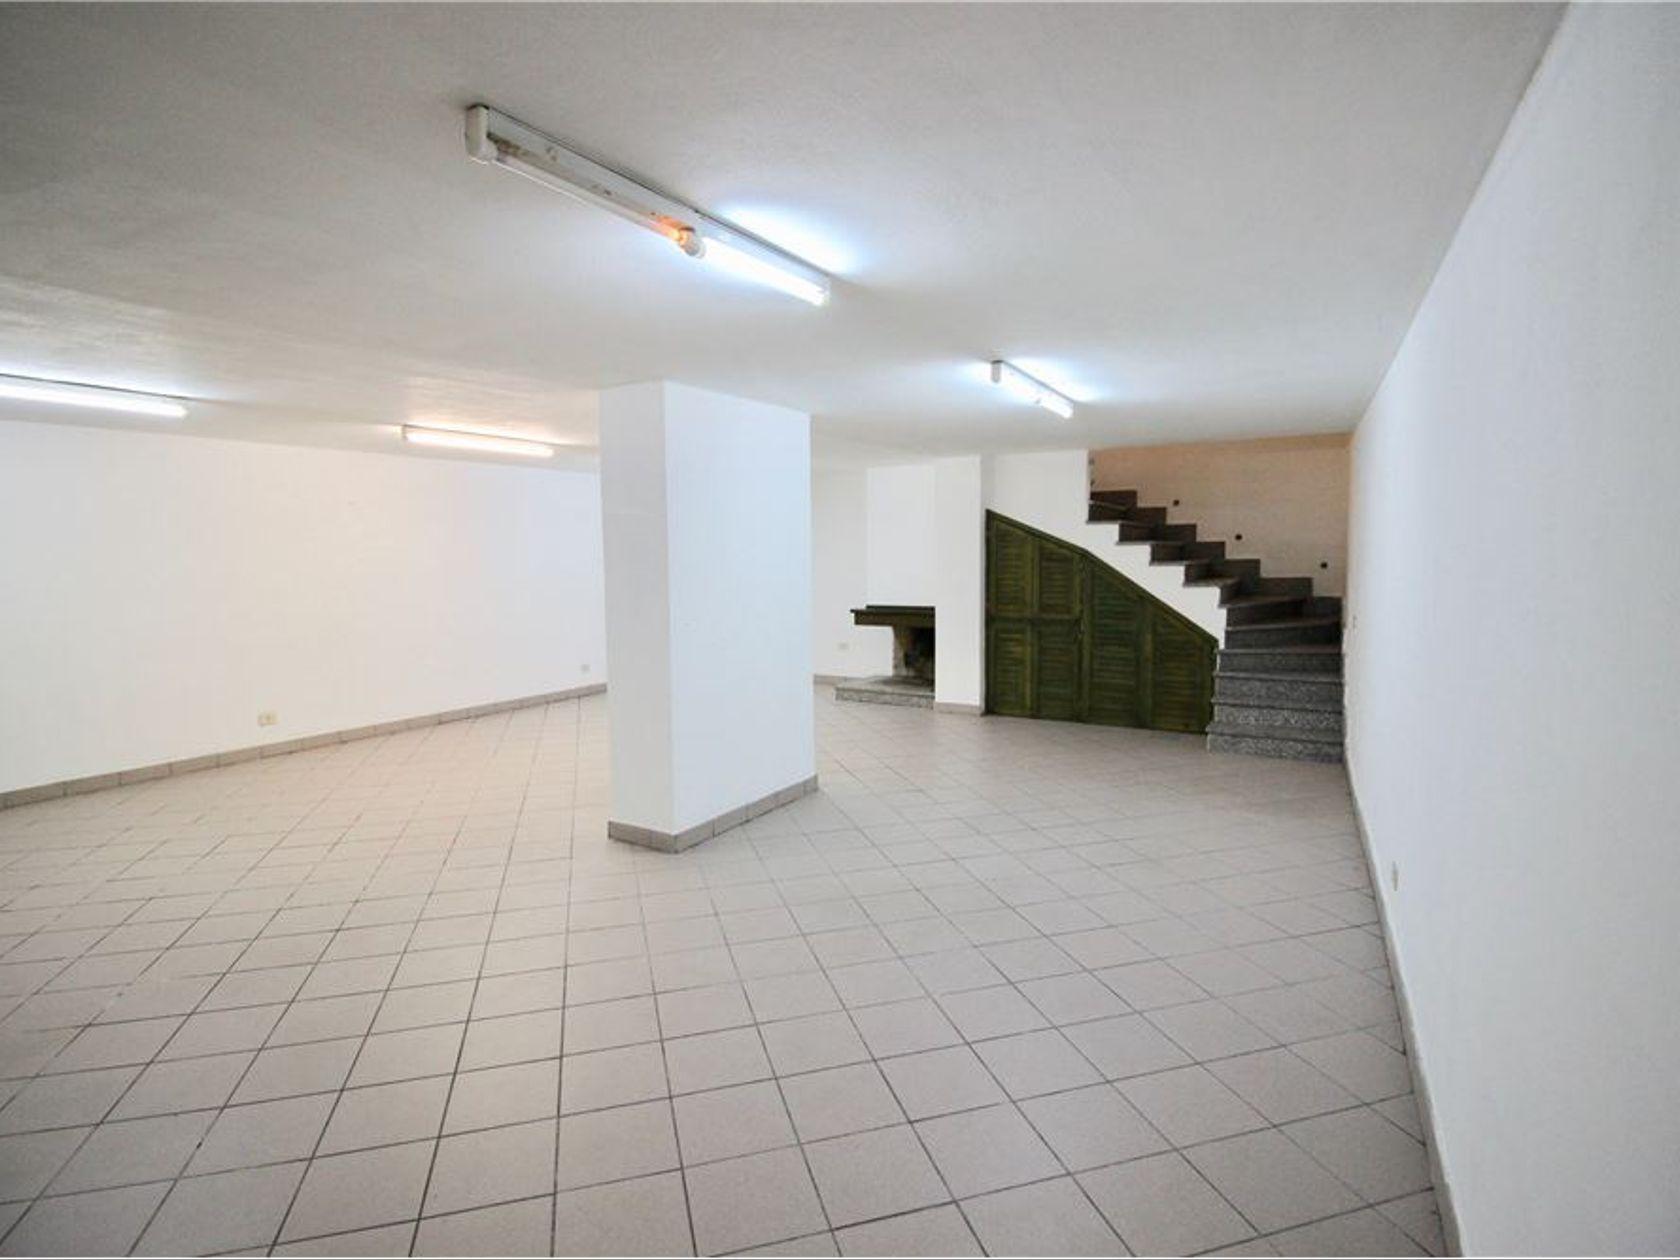 Appartamento Ss-centro, Sassari, SS Vendita - Foto 13